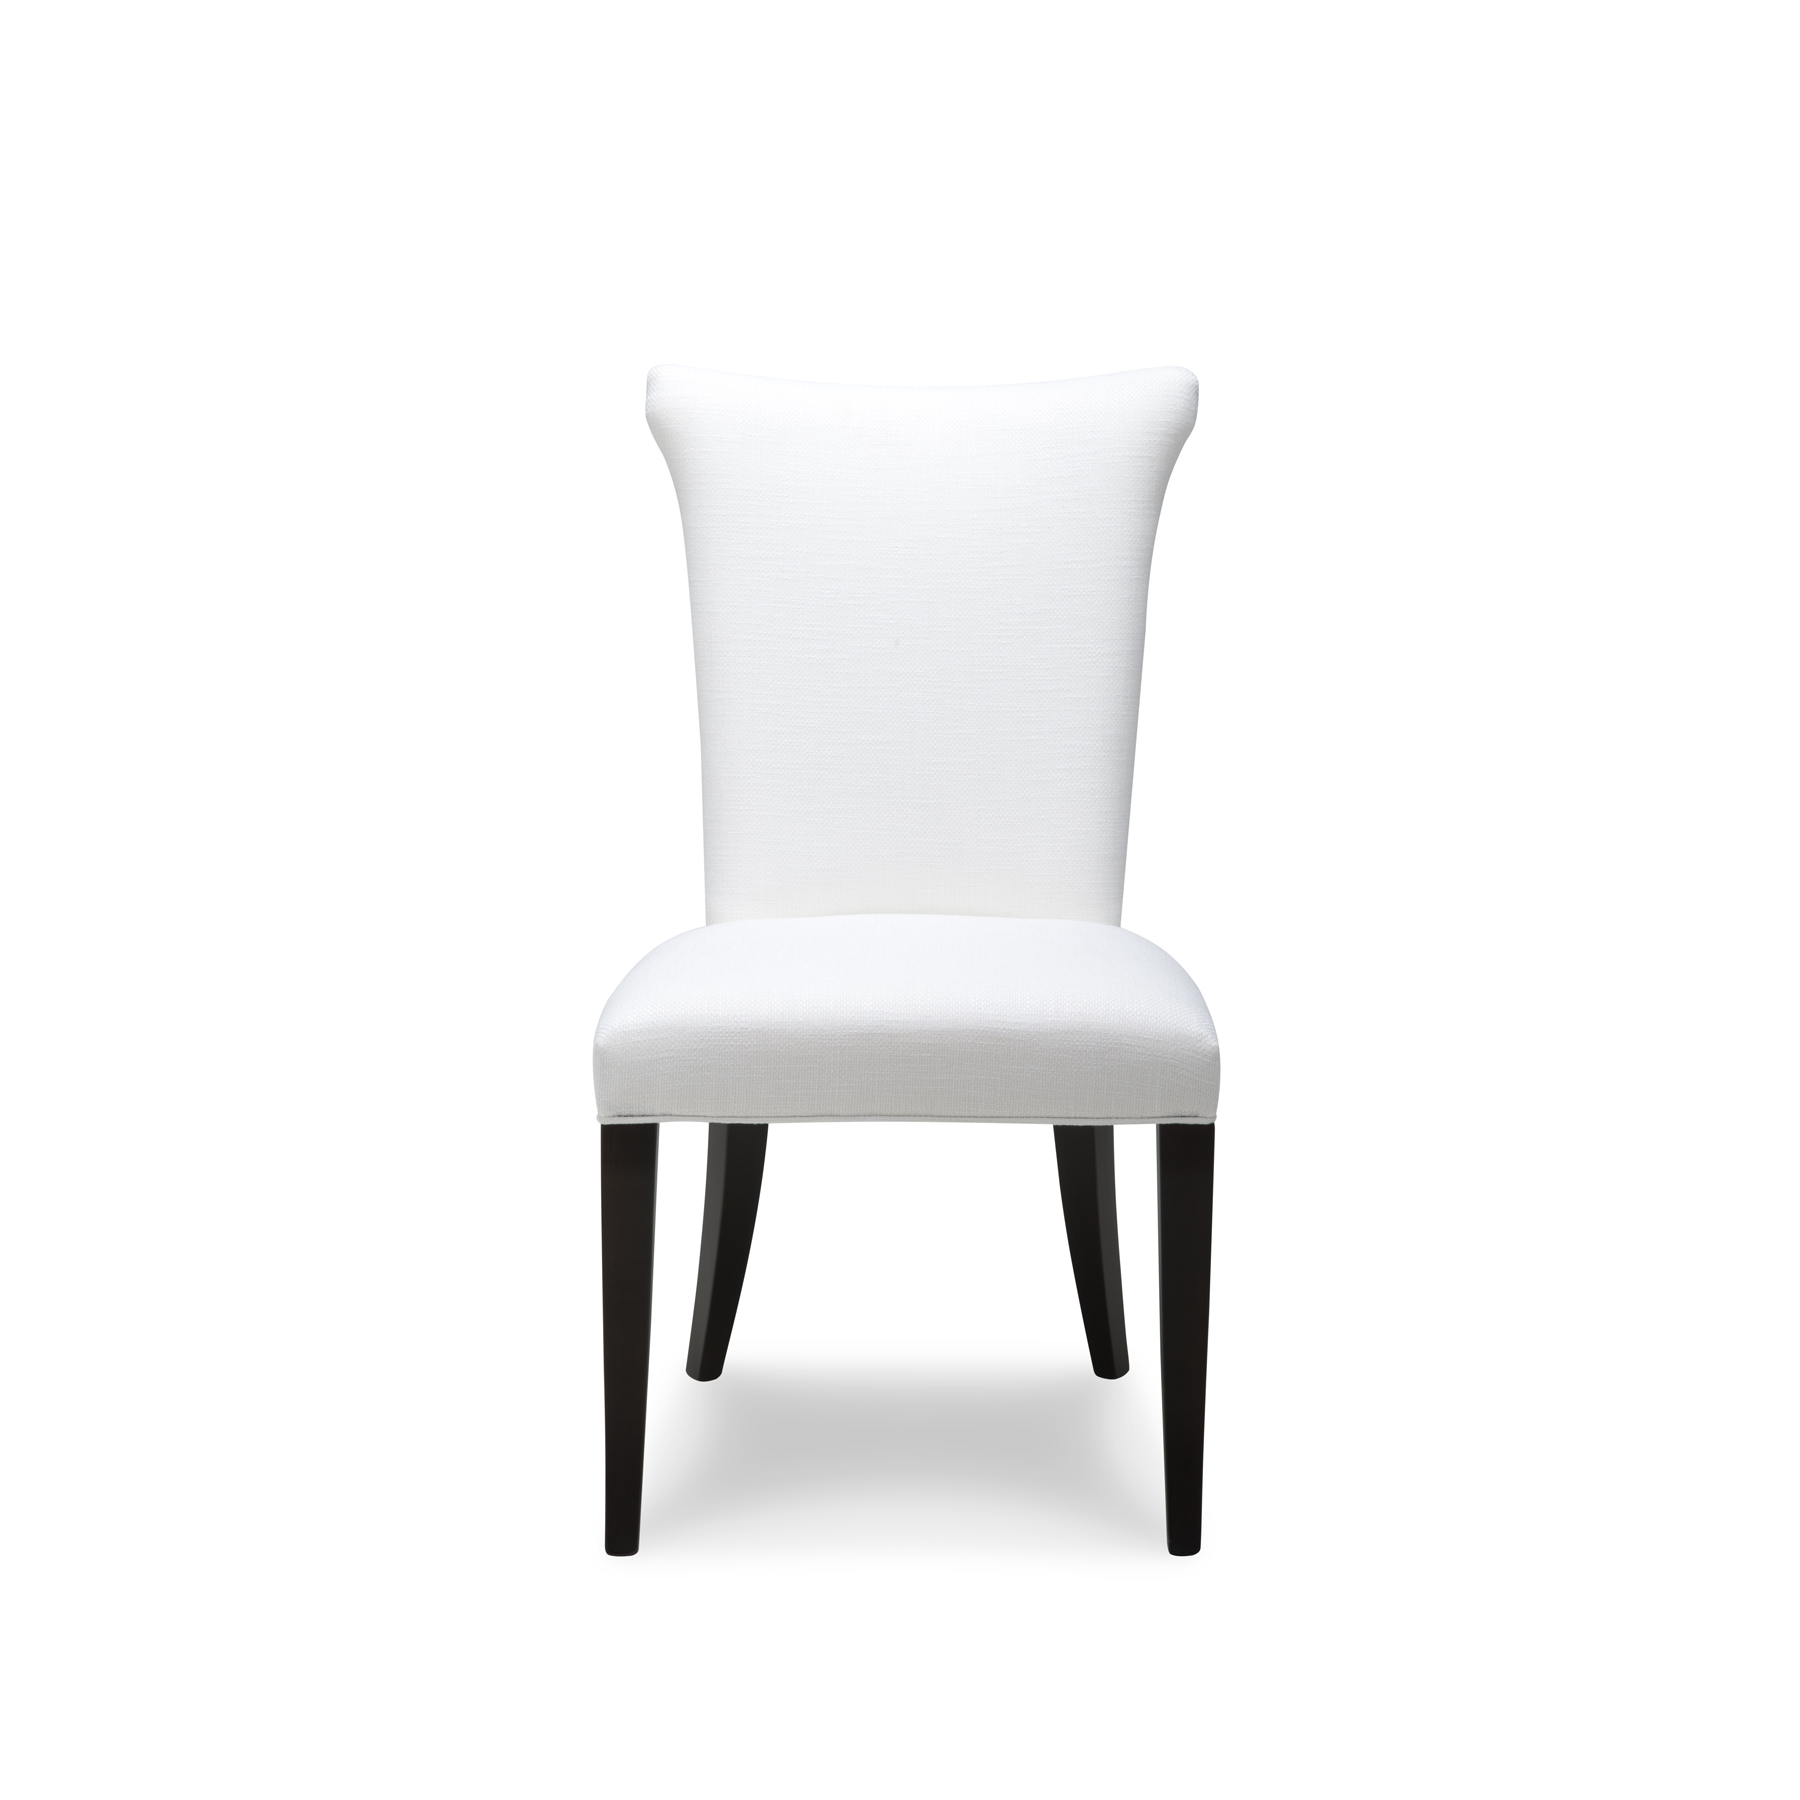 Regal-Chair-A-PROOF-1.jpg